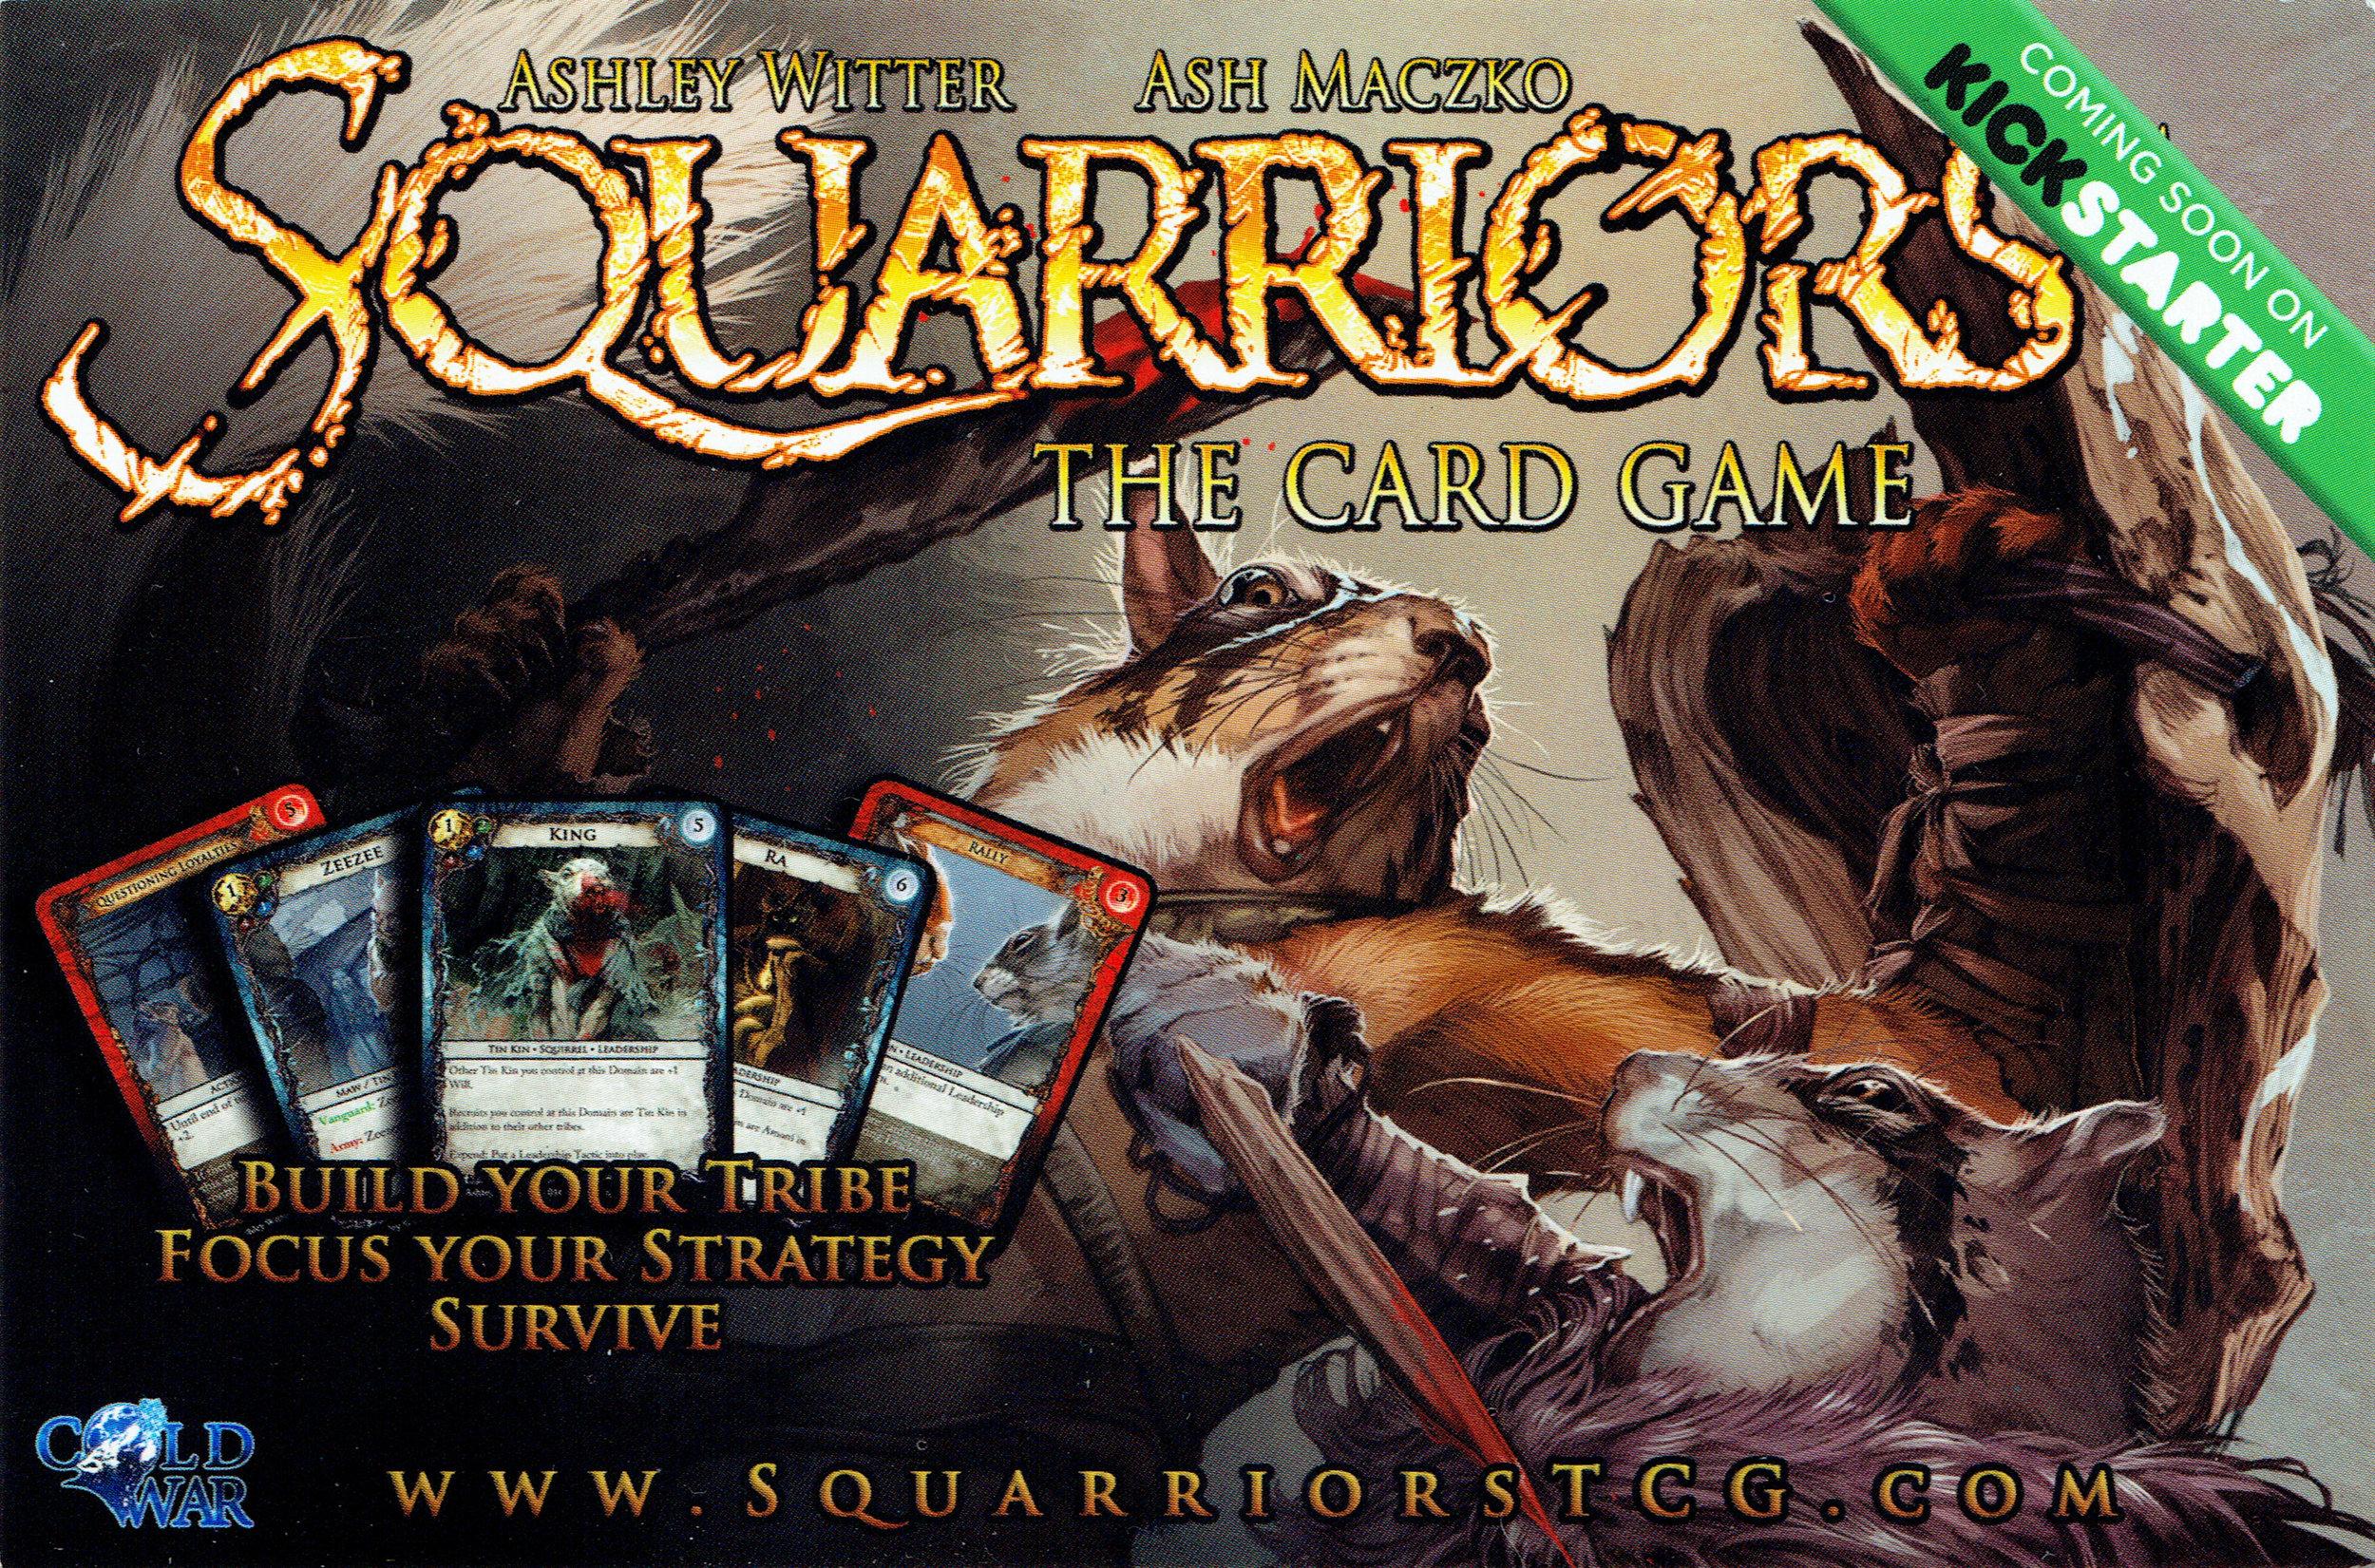 Squarriors: The Card Game KickStarter banner.